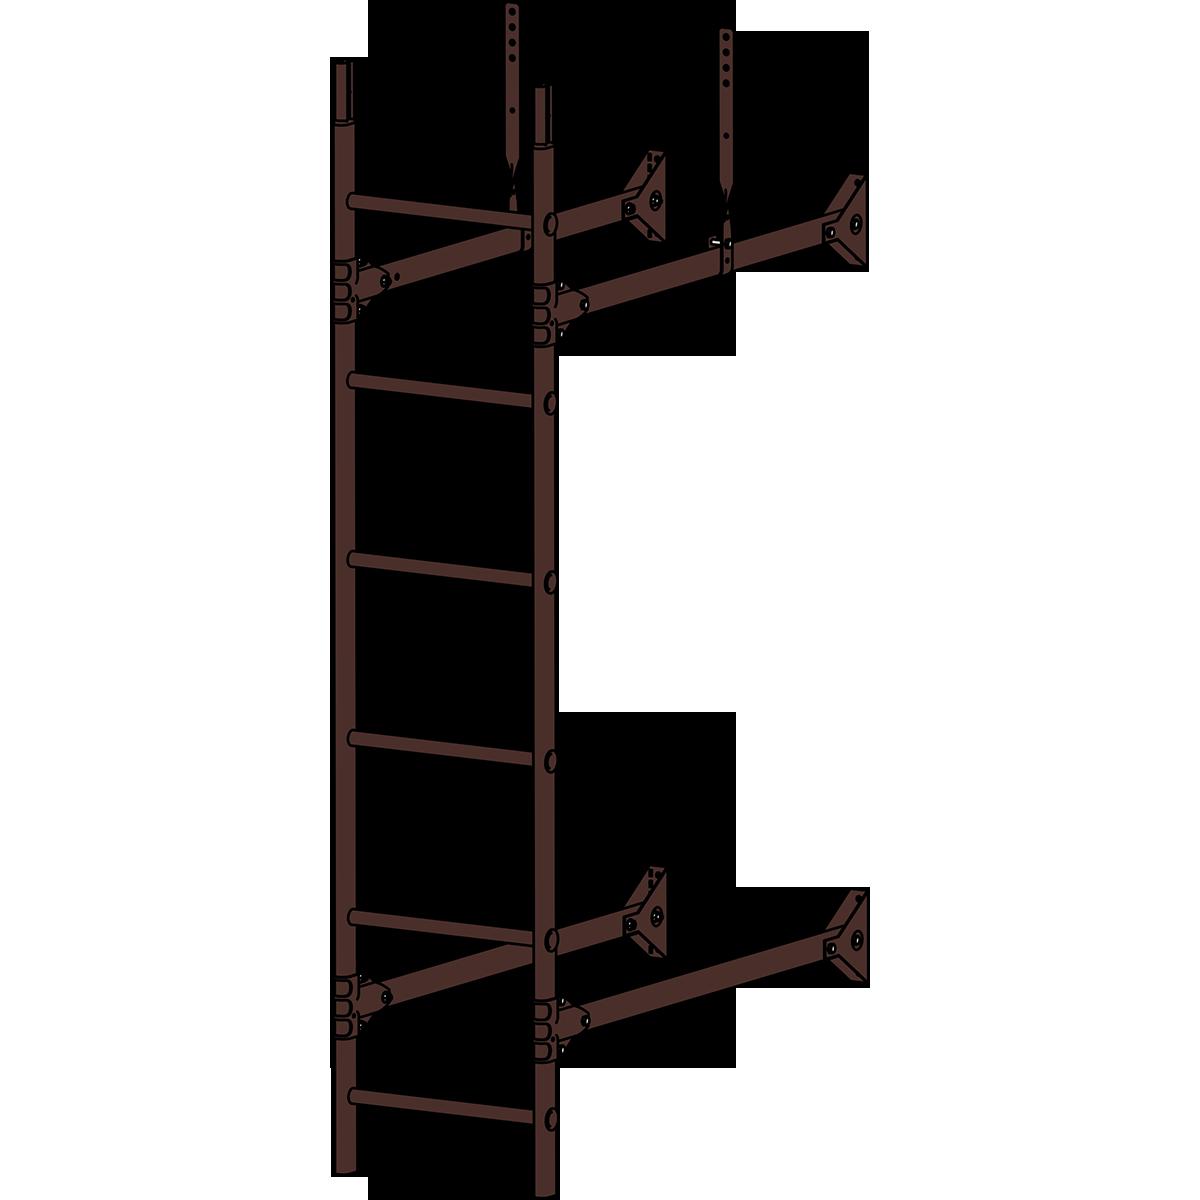 Лестница стеновая ROOFSYSTEMS PRESTIGE ZN 3м RAL 8017 Коричневый шоколад